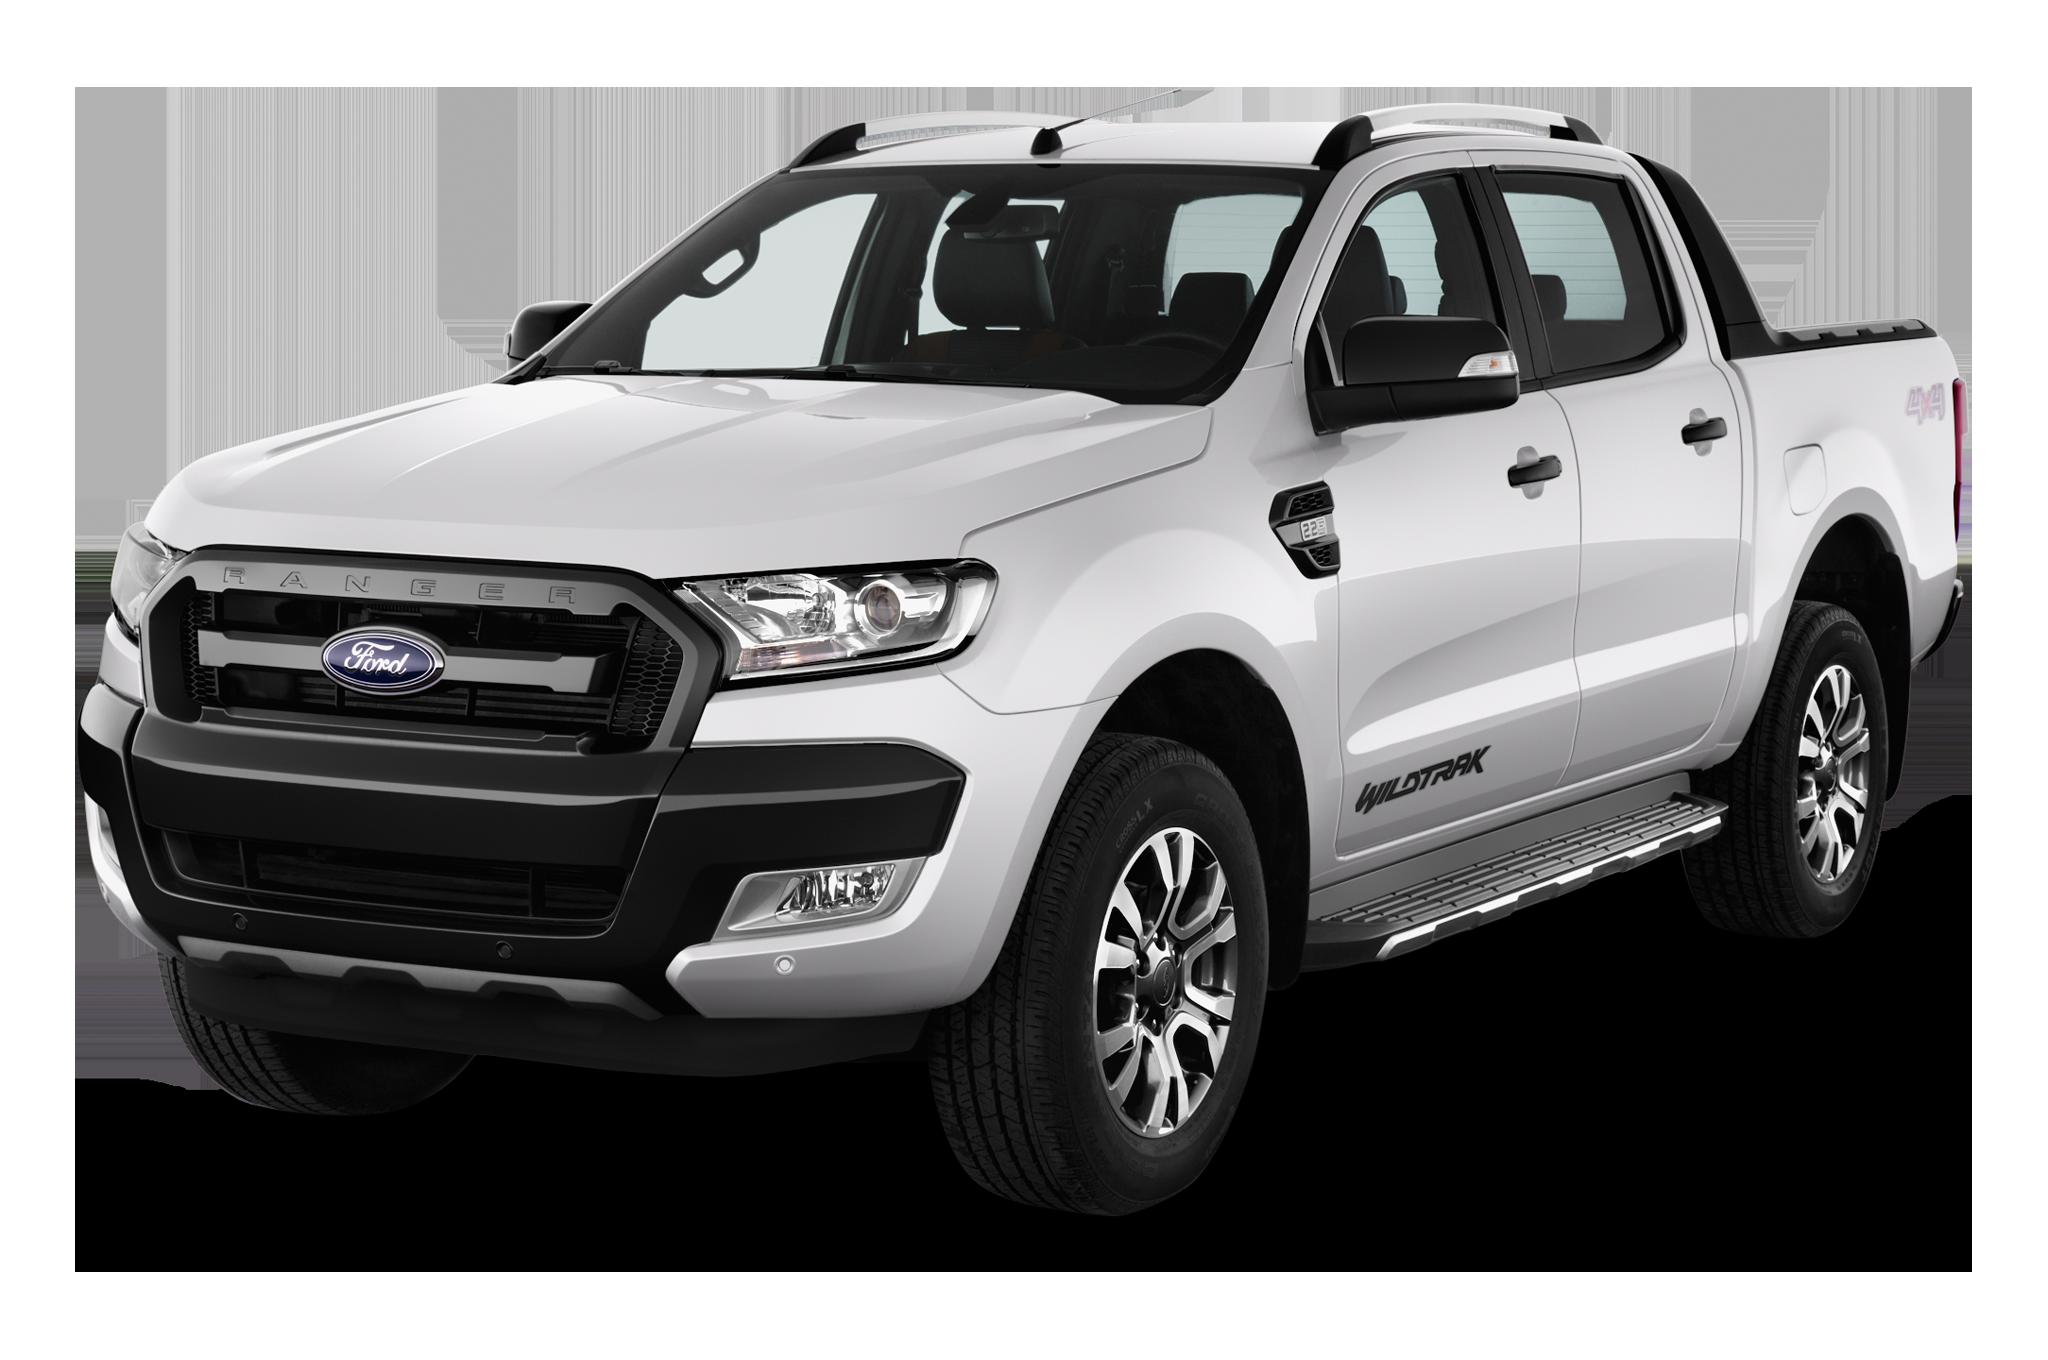 Ford Ranger Leasing Angebote : ford s max leasing angebote f r privat gewerbe ~ Aude.kayakingforconservation.com Haus und Dekorationen